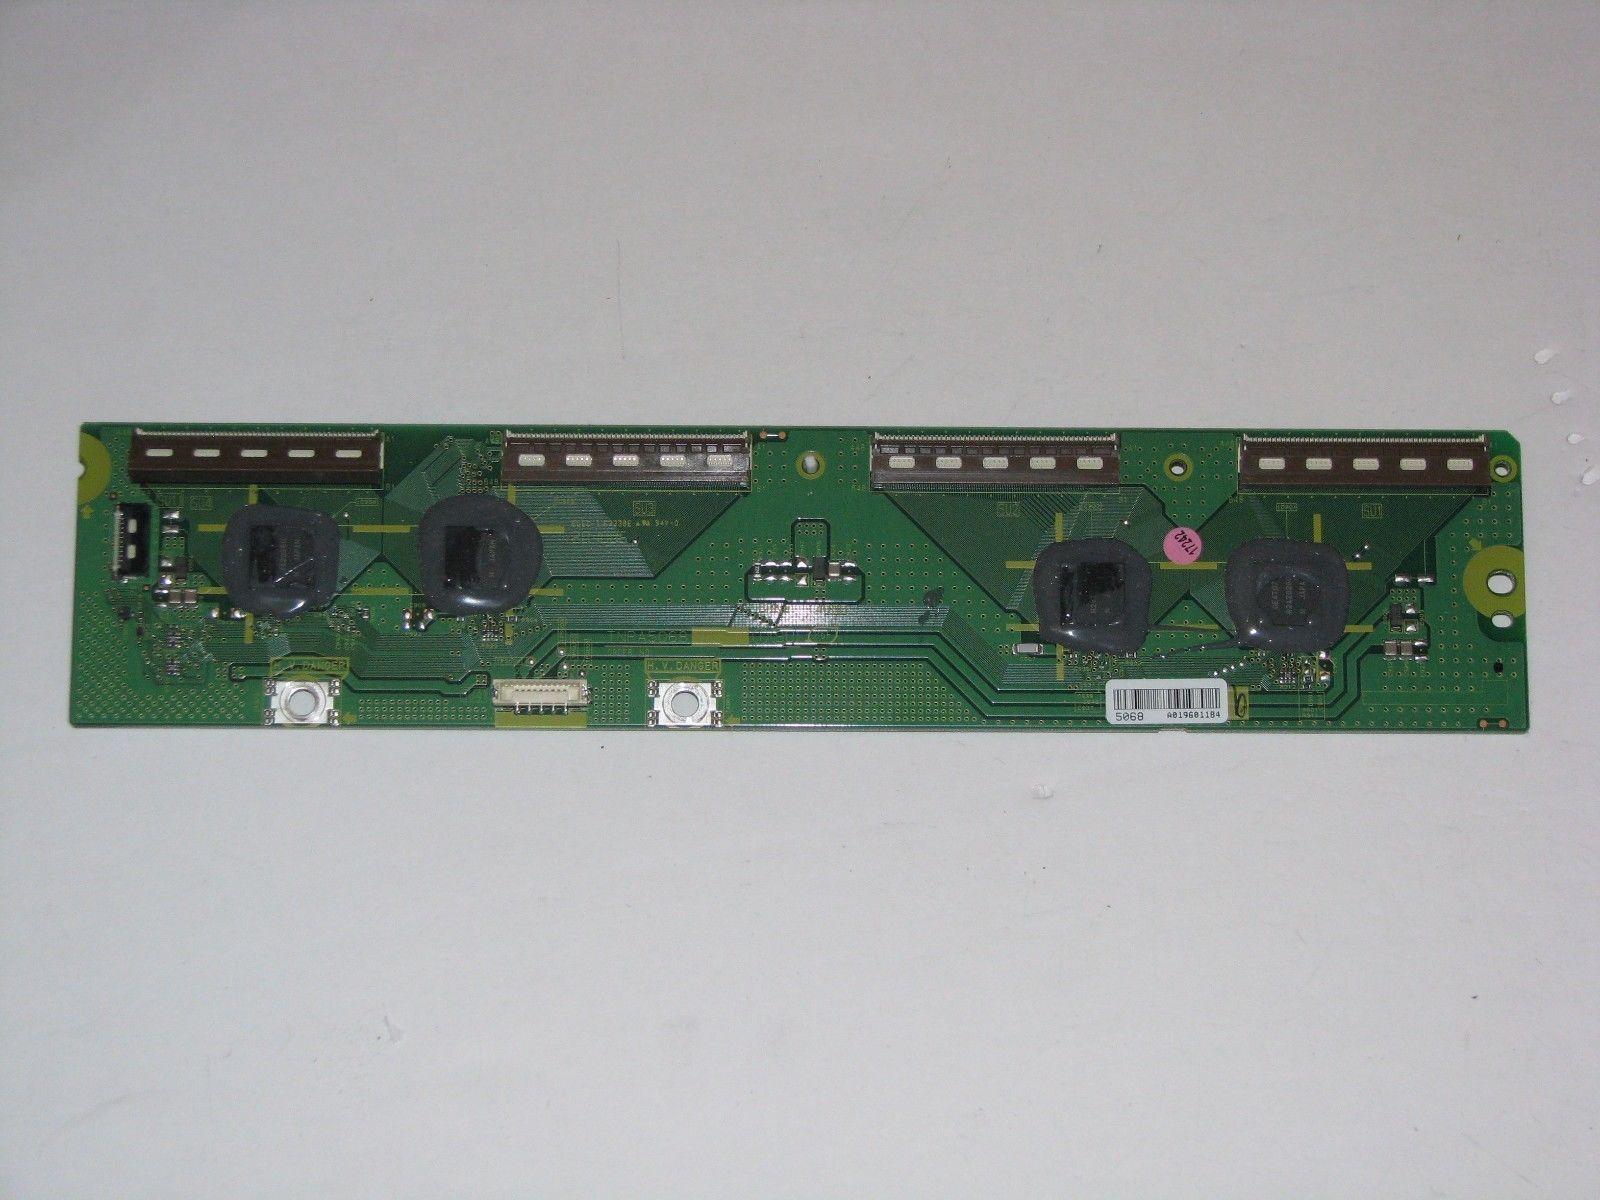 Panasonic TH-50PD12U TC-50PX14 TC-P50X1 TC-P50C1 TX-P50X10B SD Board TNPA4781